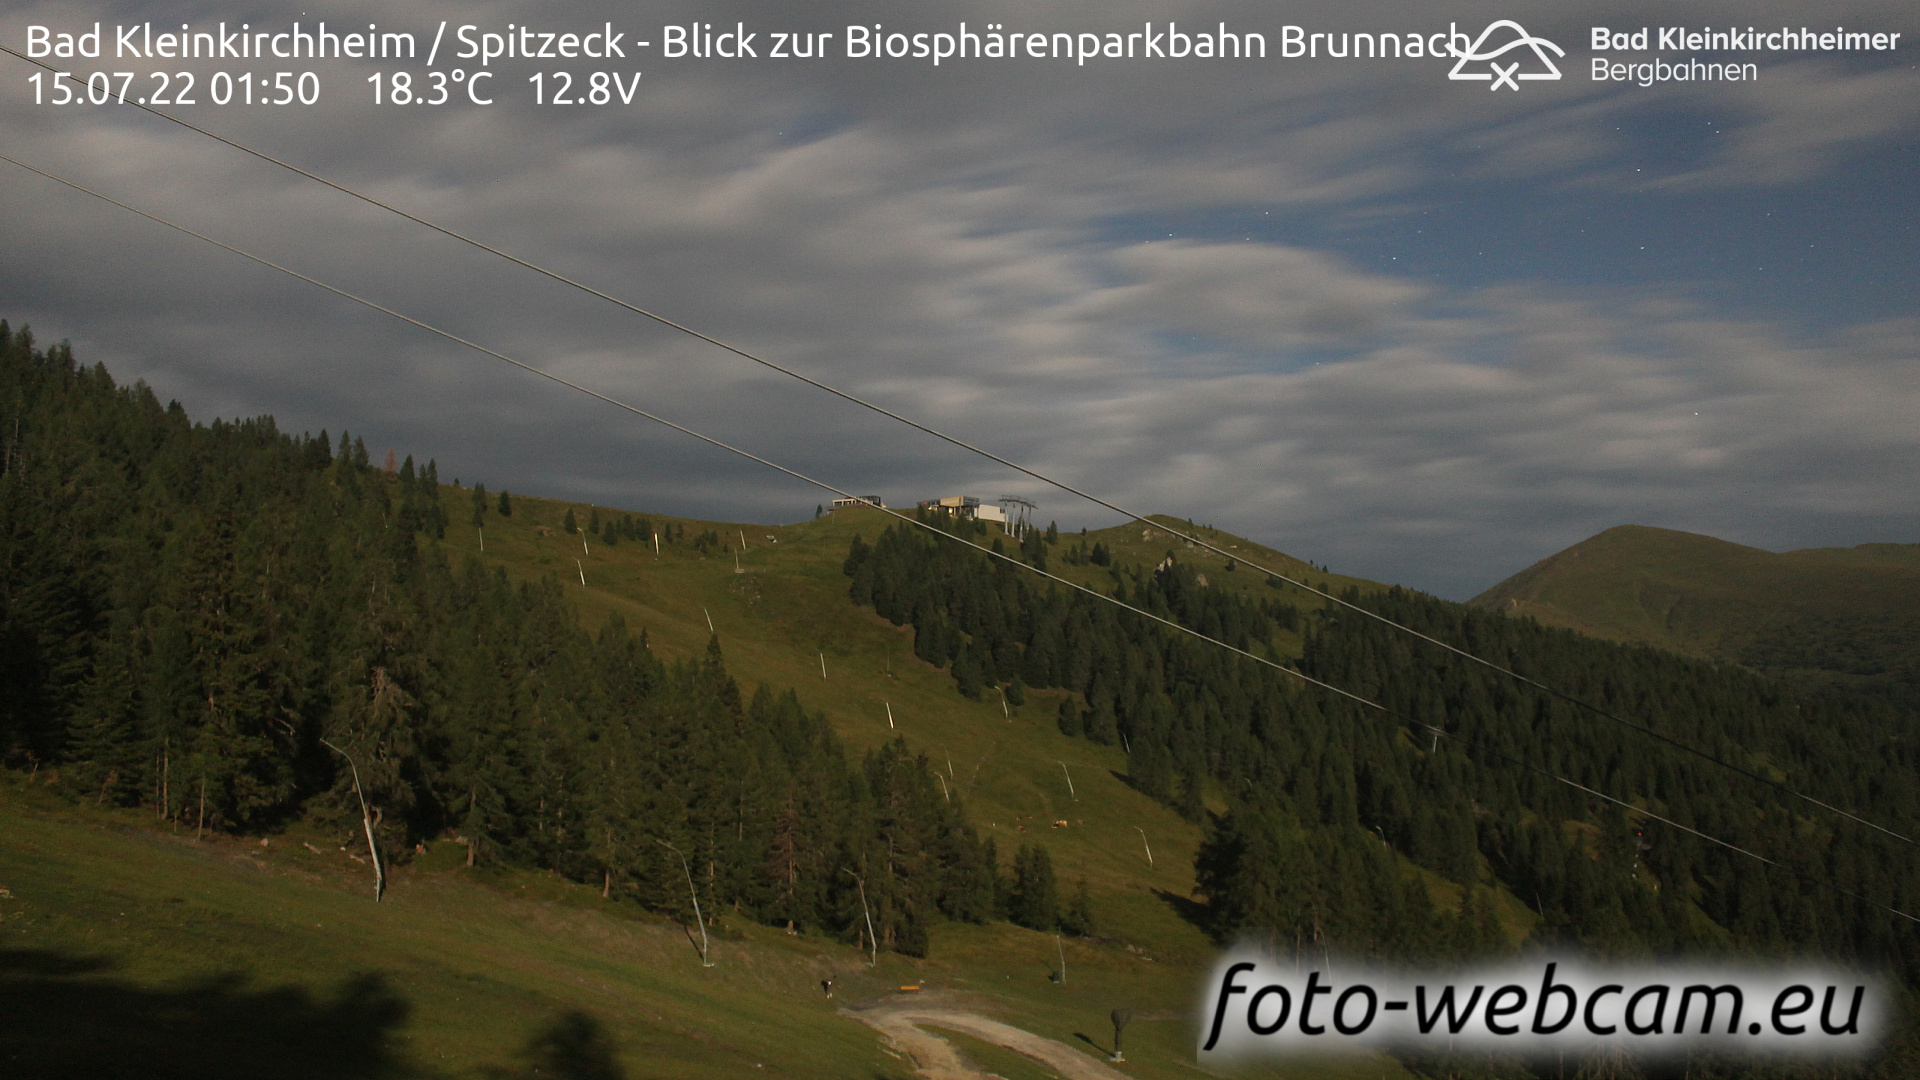 Bad Kleinkirchheim Sun. 01:28